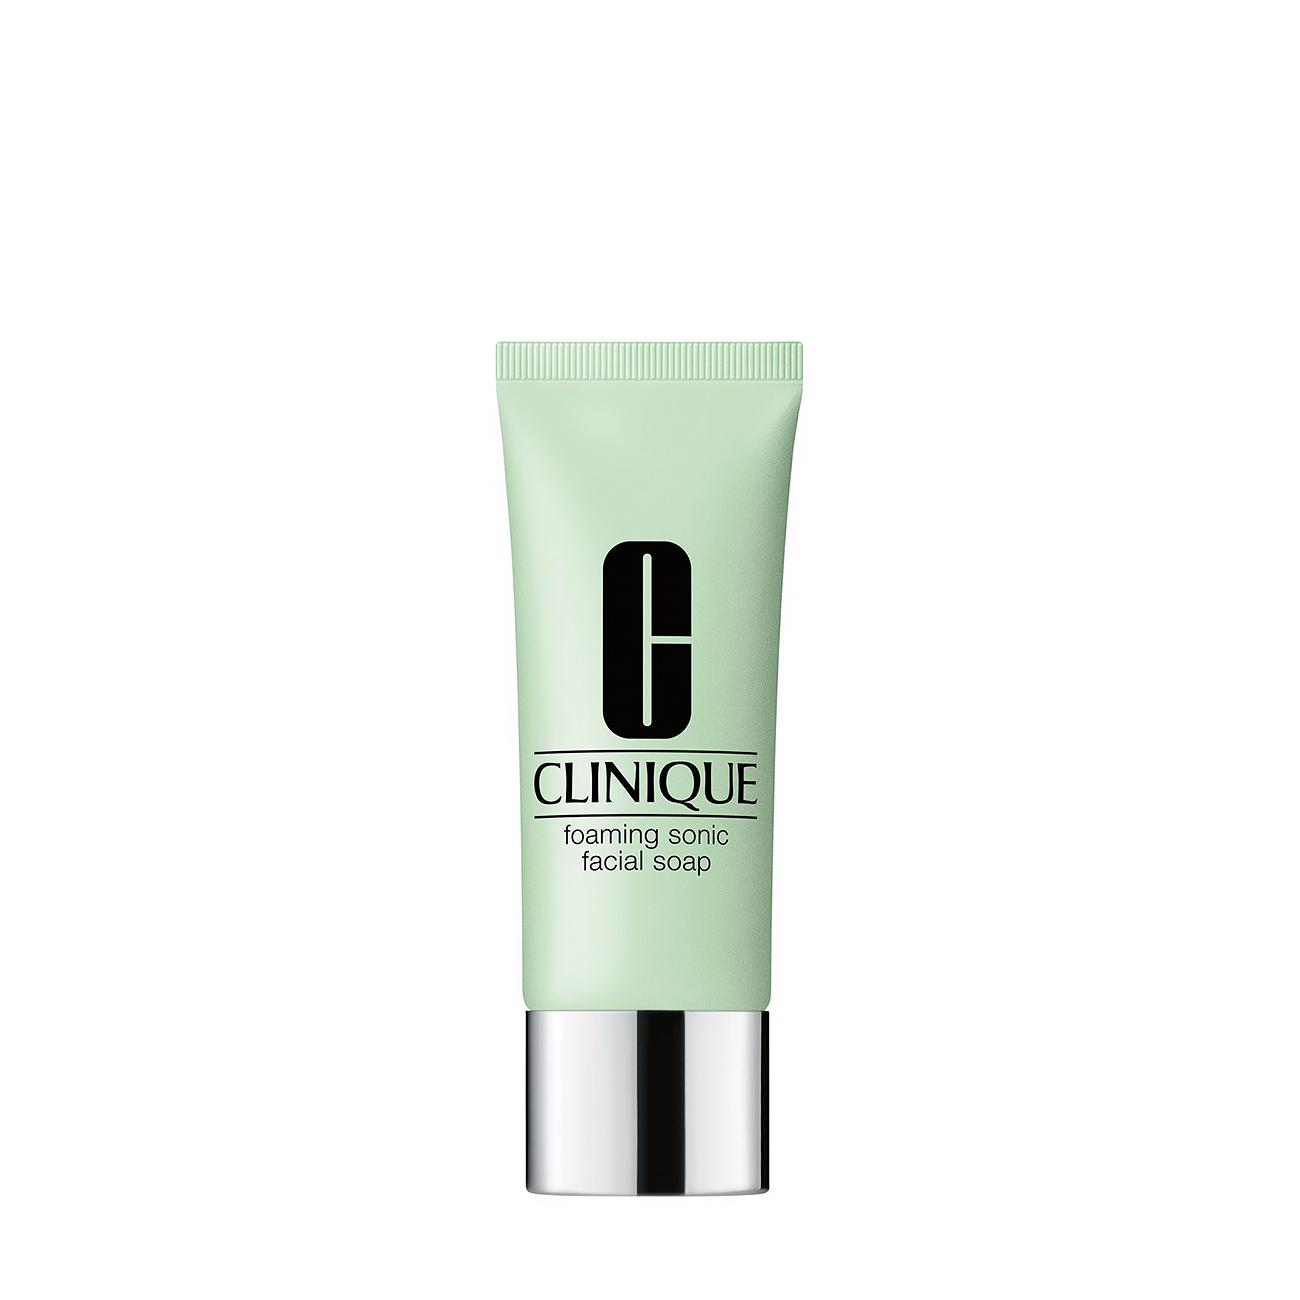 Foaming Sonic Facial Soap Mini 30ml Clinique imagine 2021 bestvalue.eu